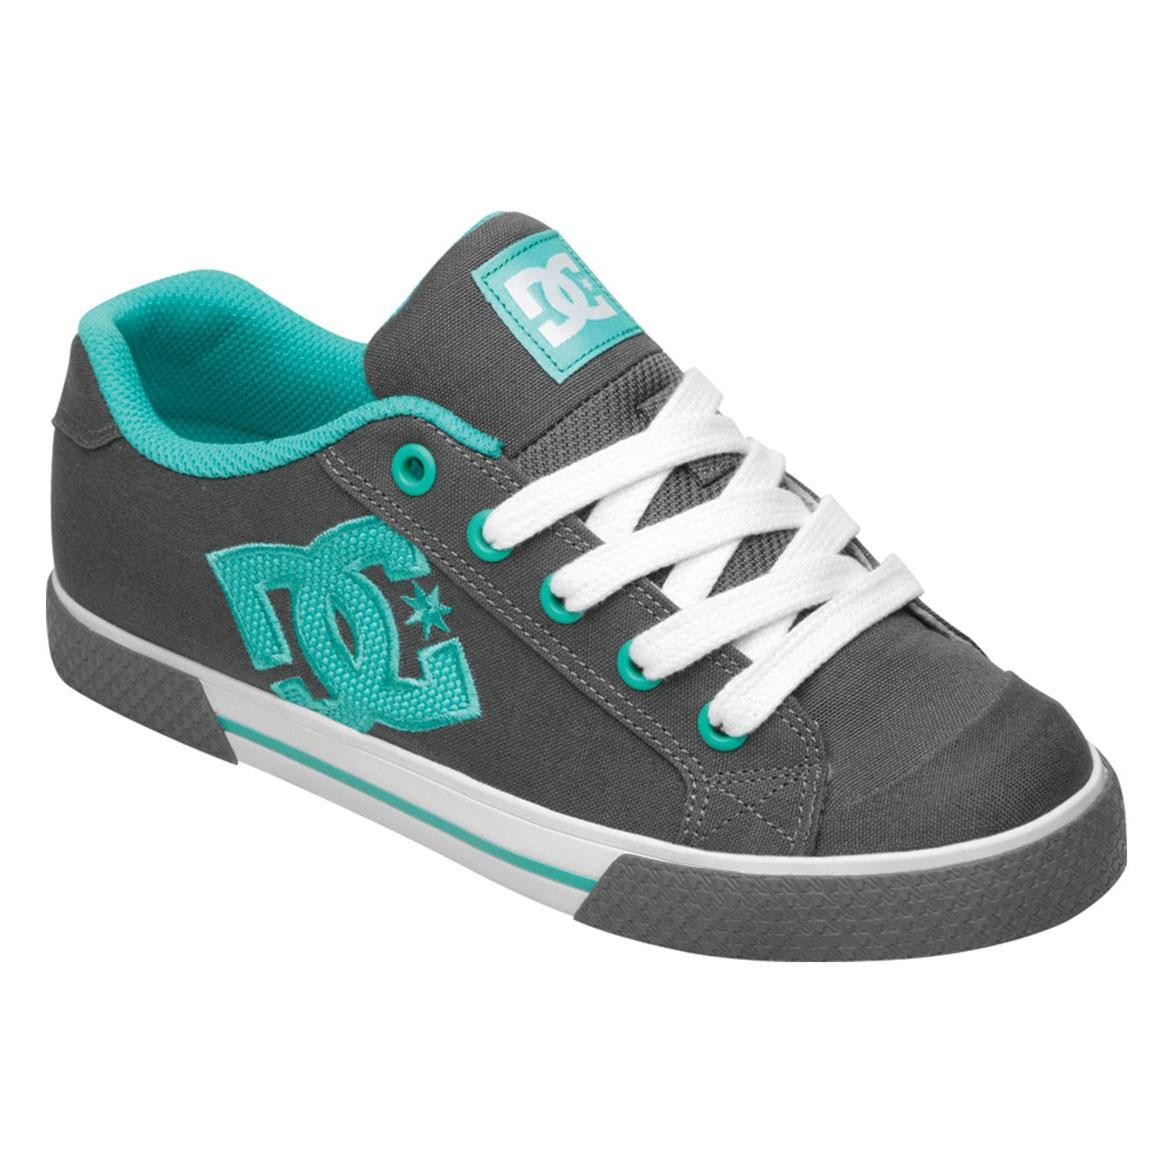 Dc Shoes Hoodies Uk